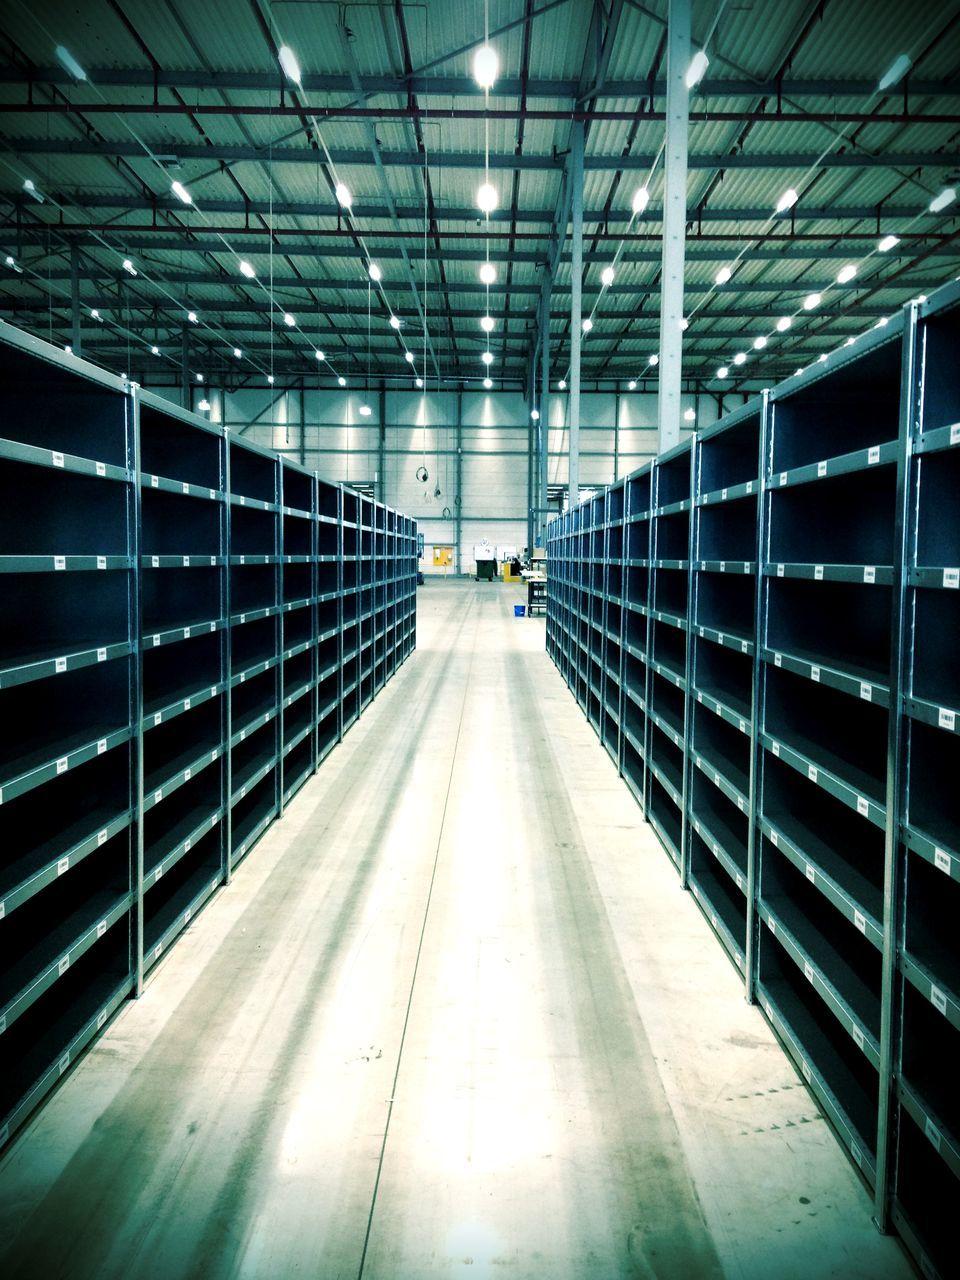 View of empty racks in warehouse